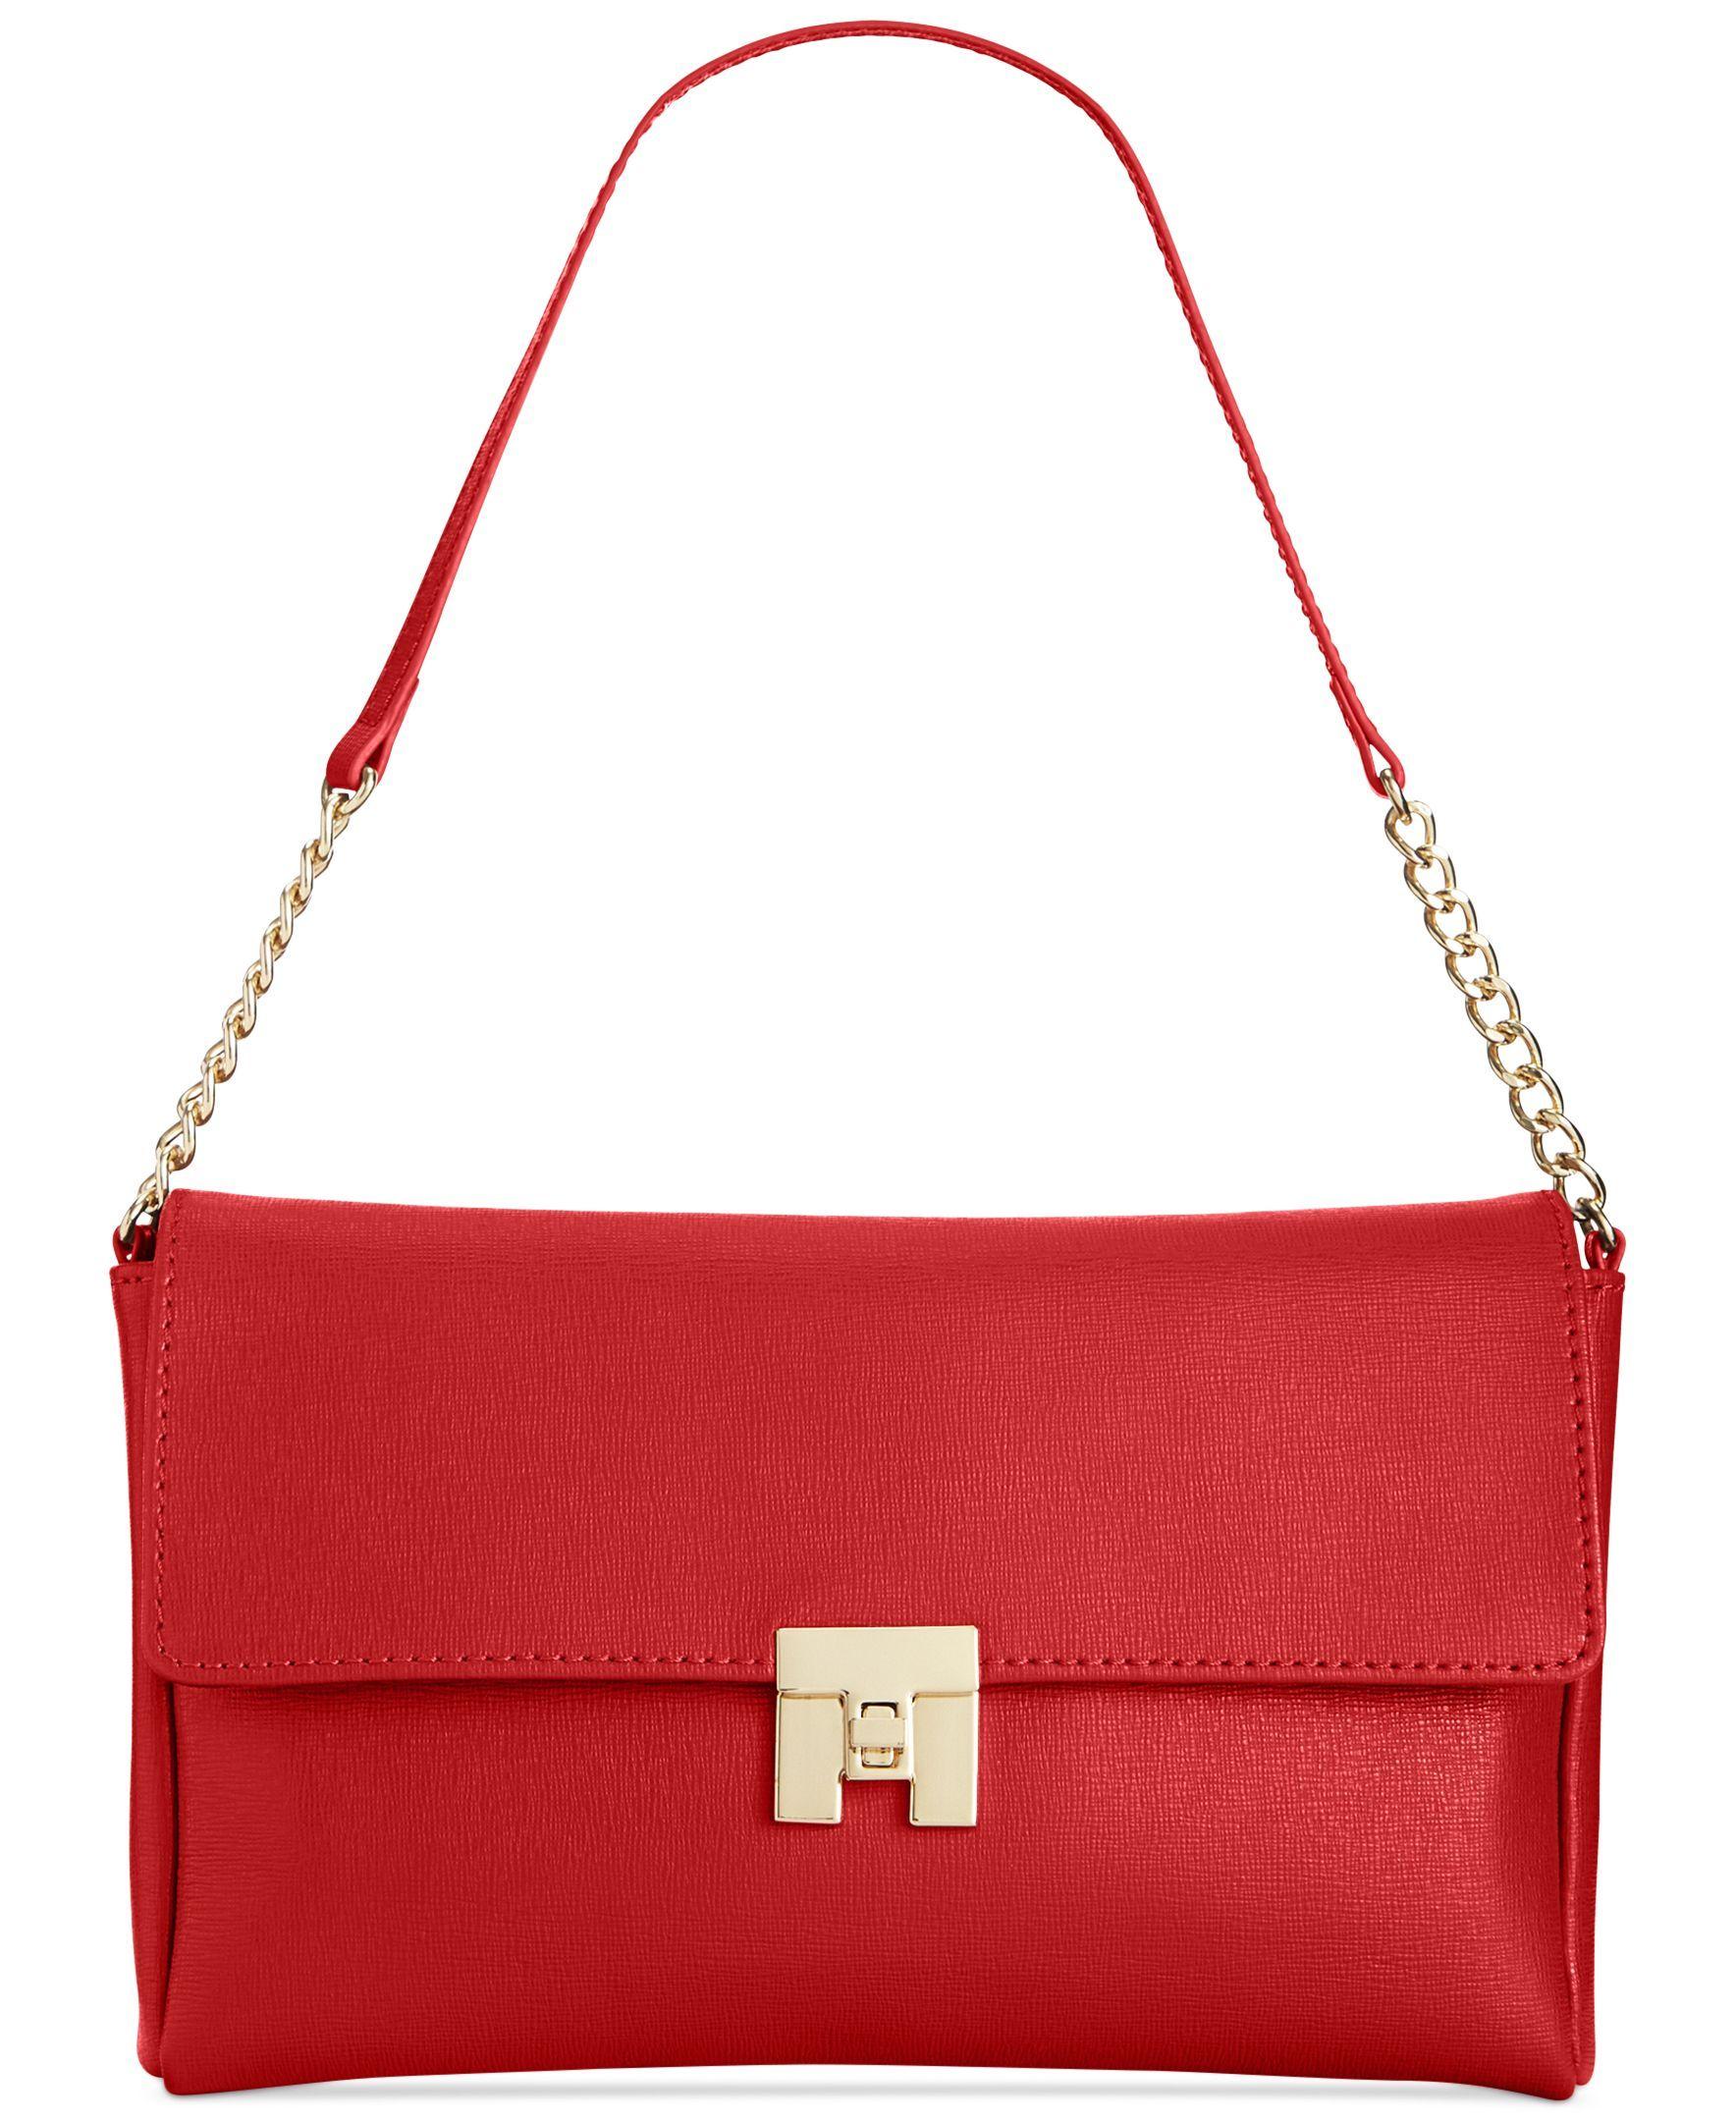 Tommy Hilfiger Th Turnlock Textured Leather Flap Shoulder Bag